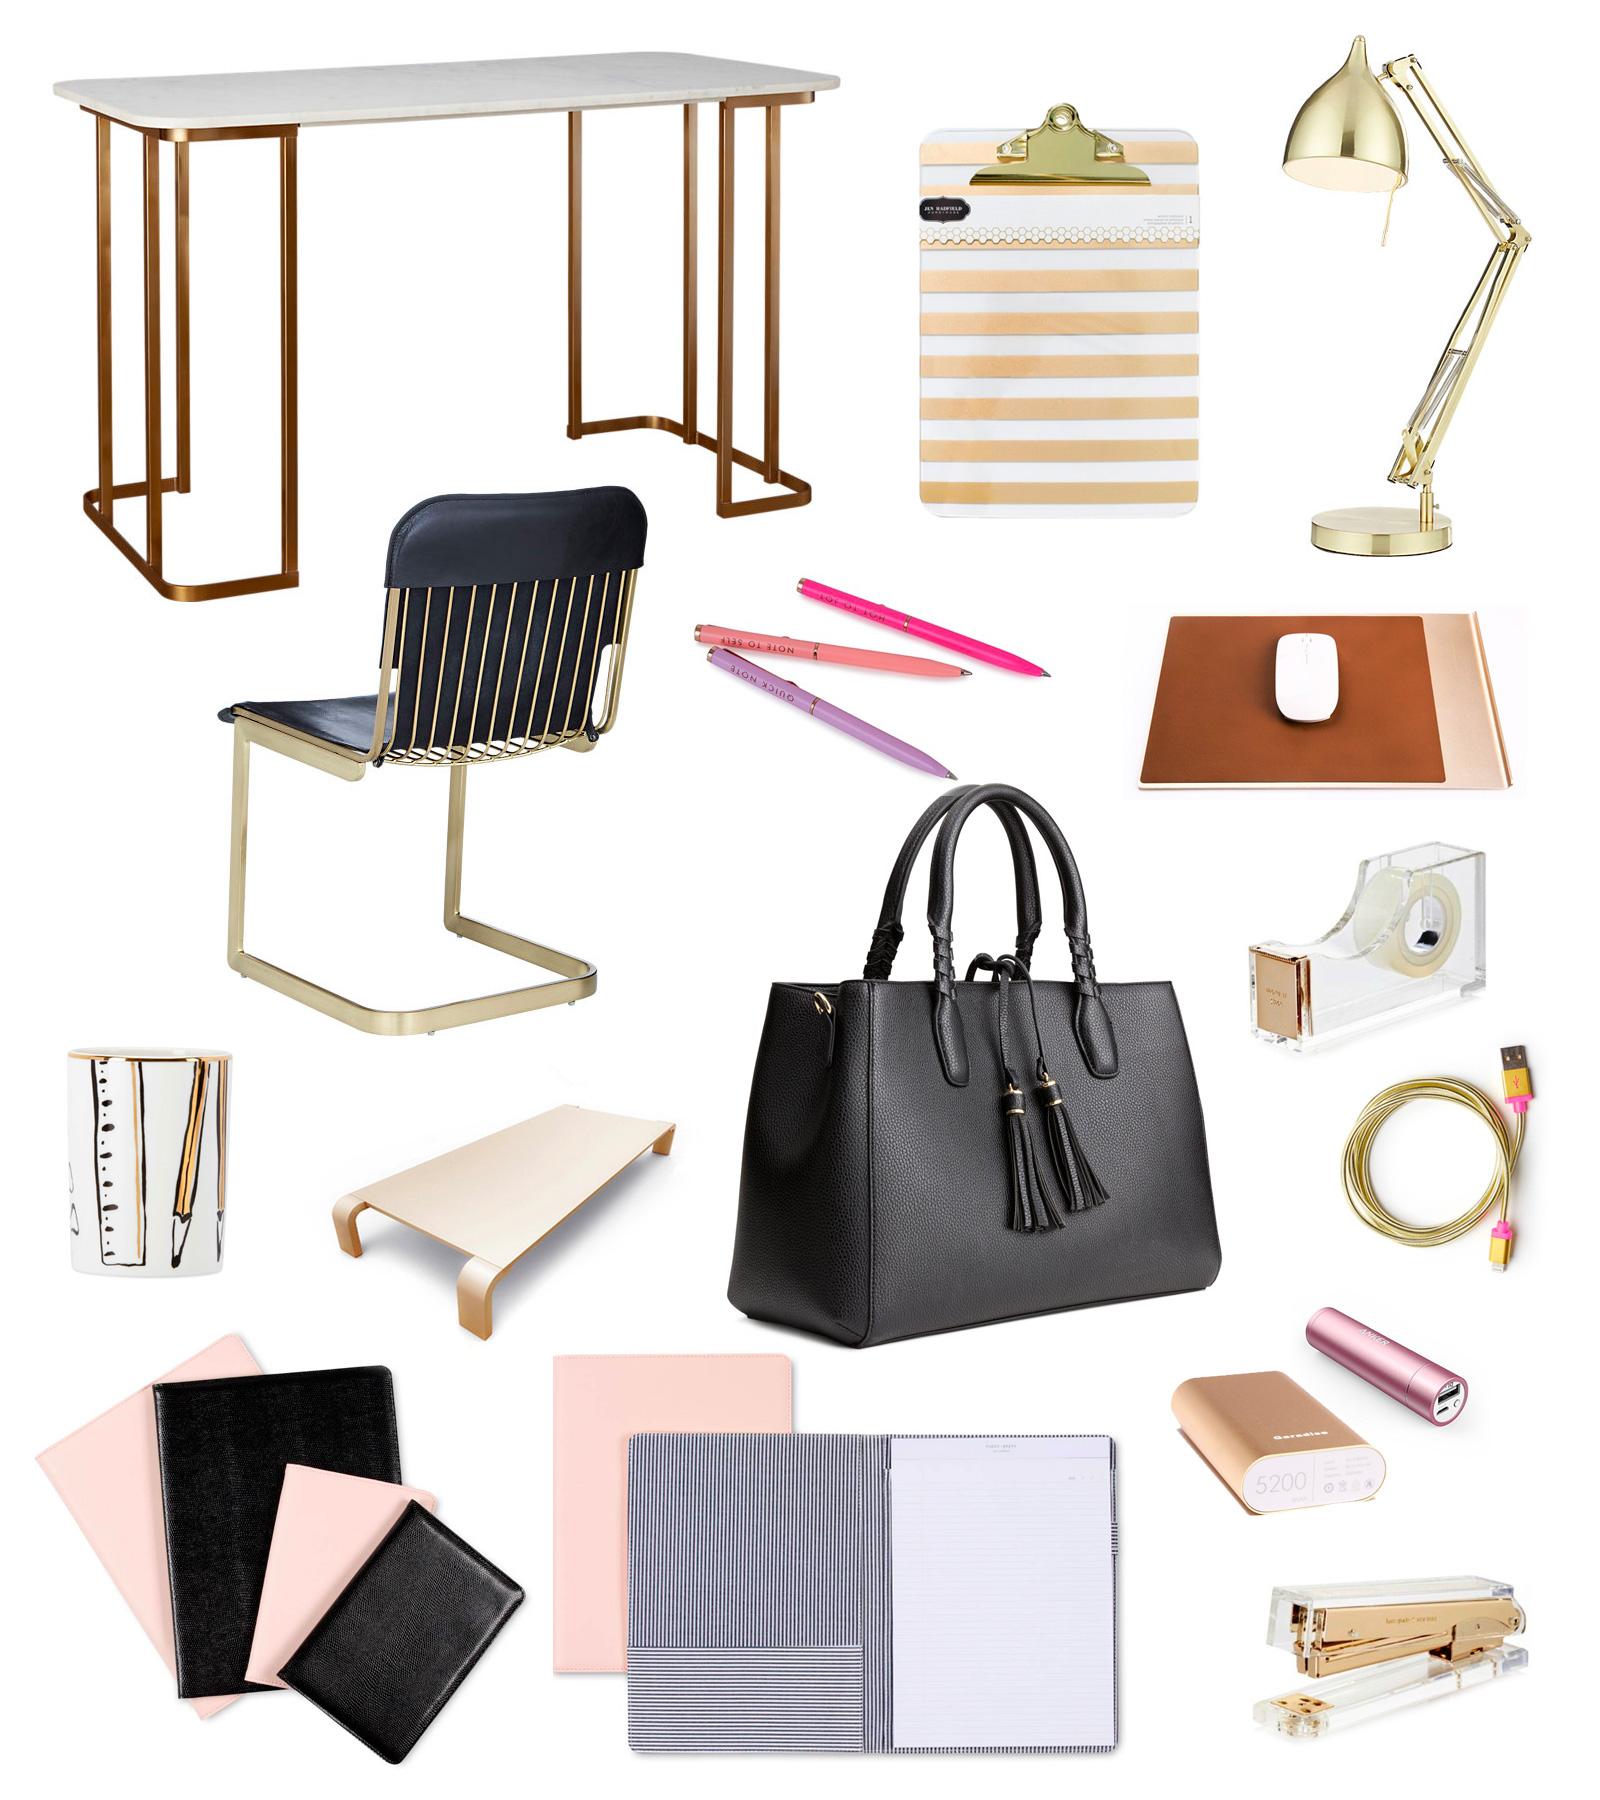 Feminine desk accessories imax maura blue desk set with gift box dimensions feminine office - Girly office desk accessories ...